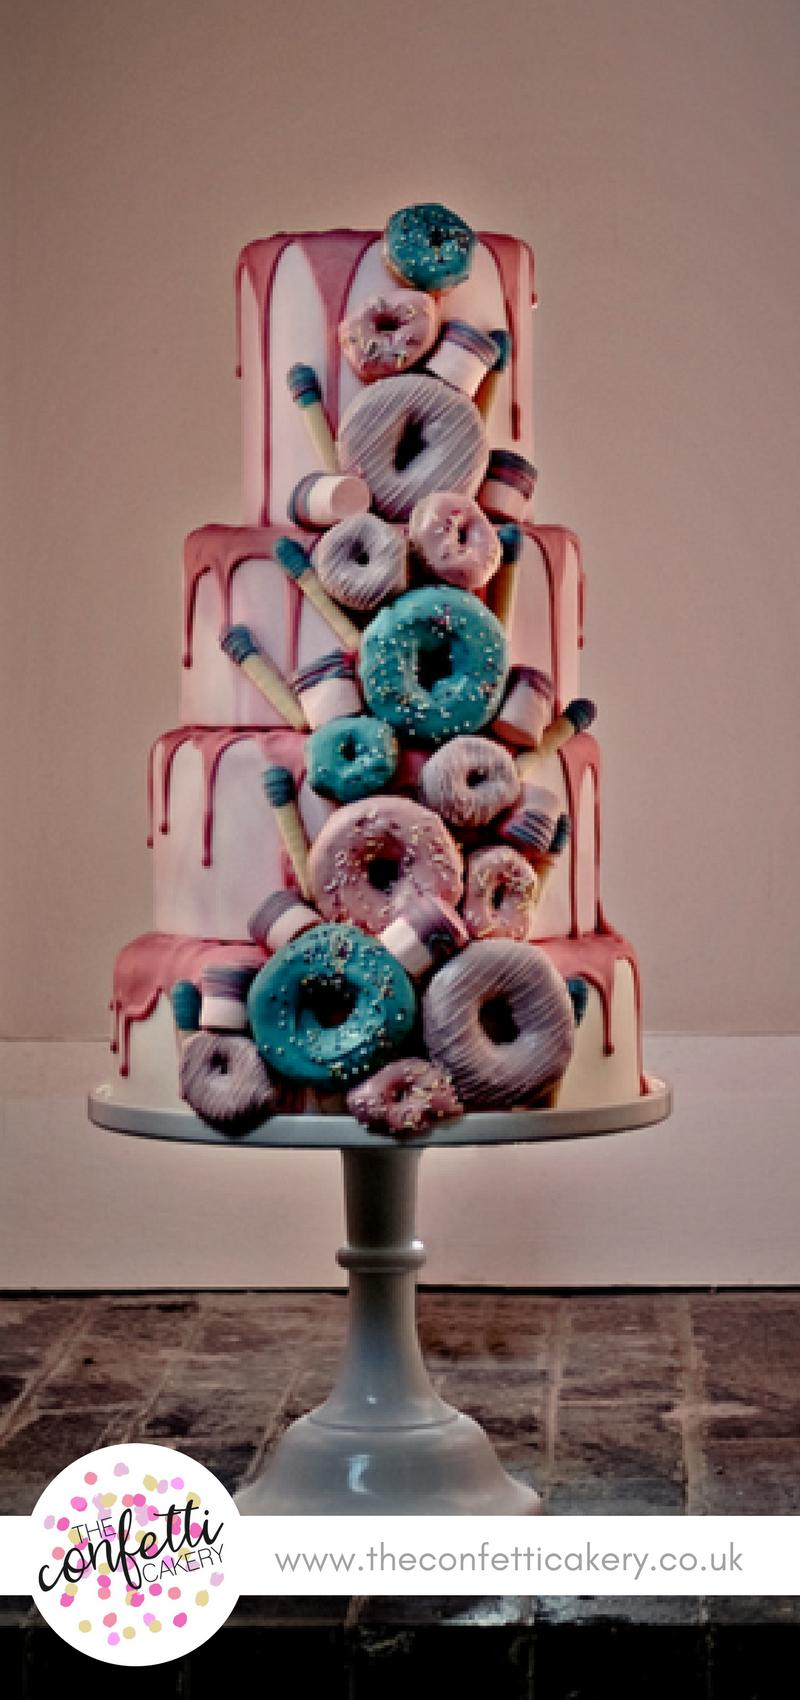 Delicious Doughnut Drip Wedding Cake The Confetti Cakery Image Samantha Hook